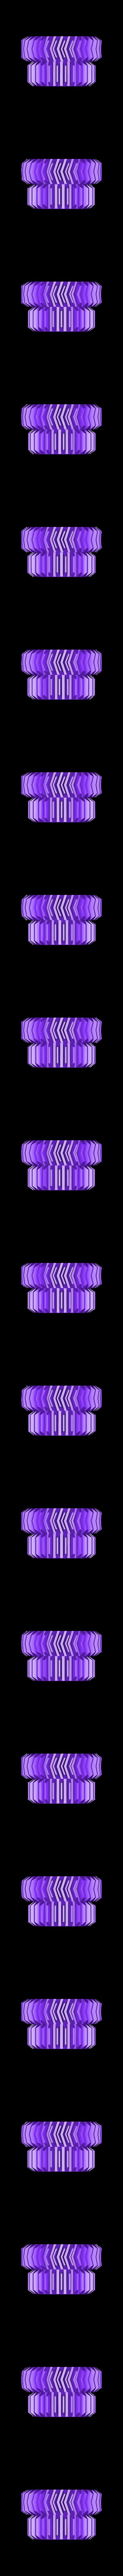 Bubble_drive_gear_A.stl Download free STL file Bubbles! • 3D printer object, Zippityboomba